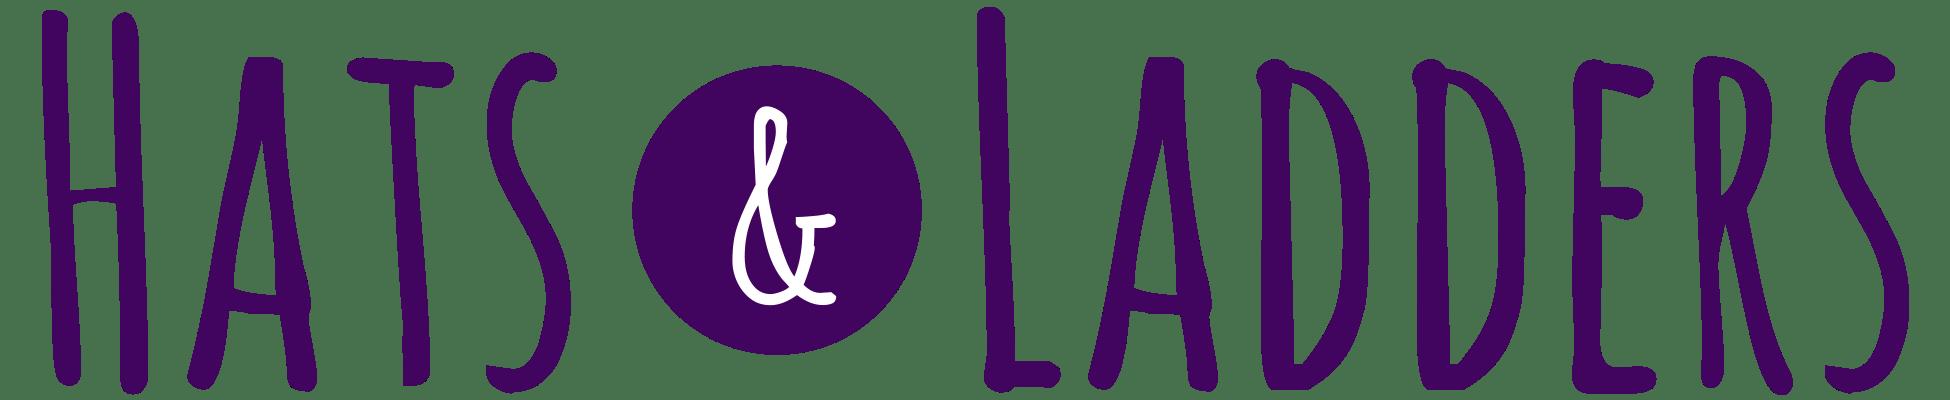 Hands & Ladders Logo